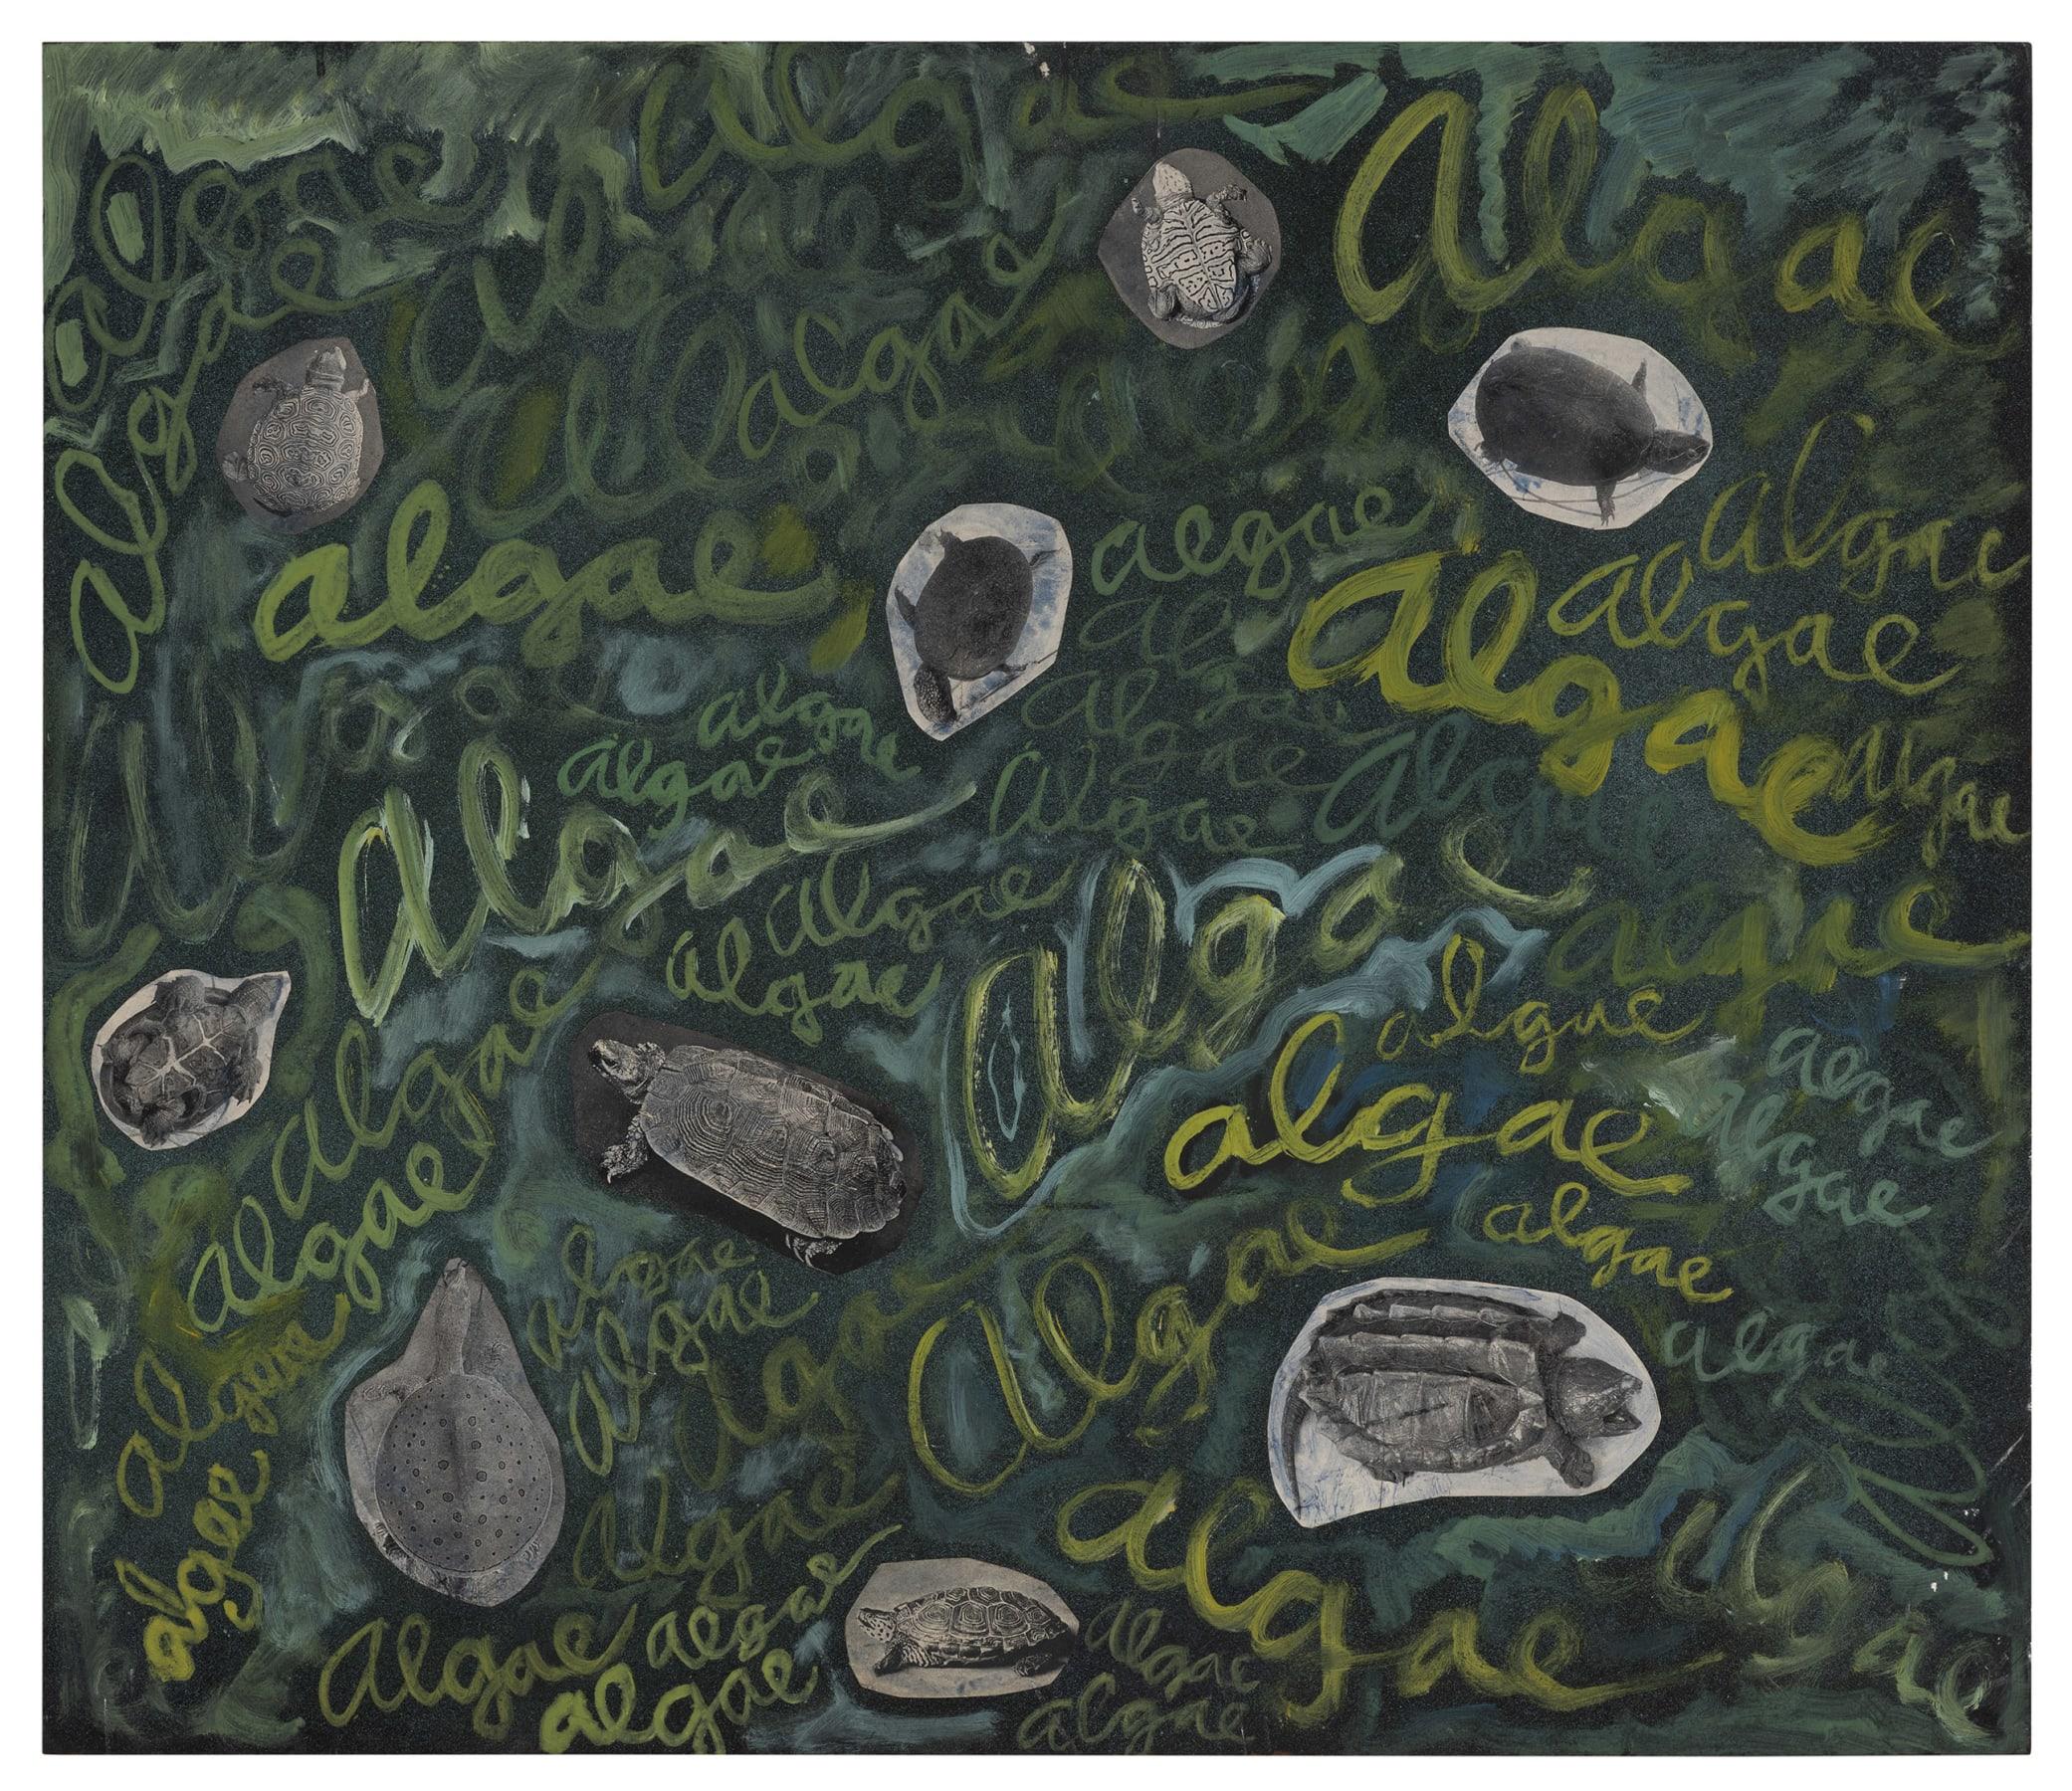 Robert Smithson. Algae, algae, ca. 1961-1963. Paint and photo collage on Masonite. 23 3/8 x 27 1/4 x 1/4 in. (59.3 x 69.1 x 0.6 cm). ©Holt/Smithson Foundation, Licensed by VAGA at ARS, New York.